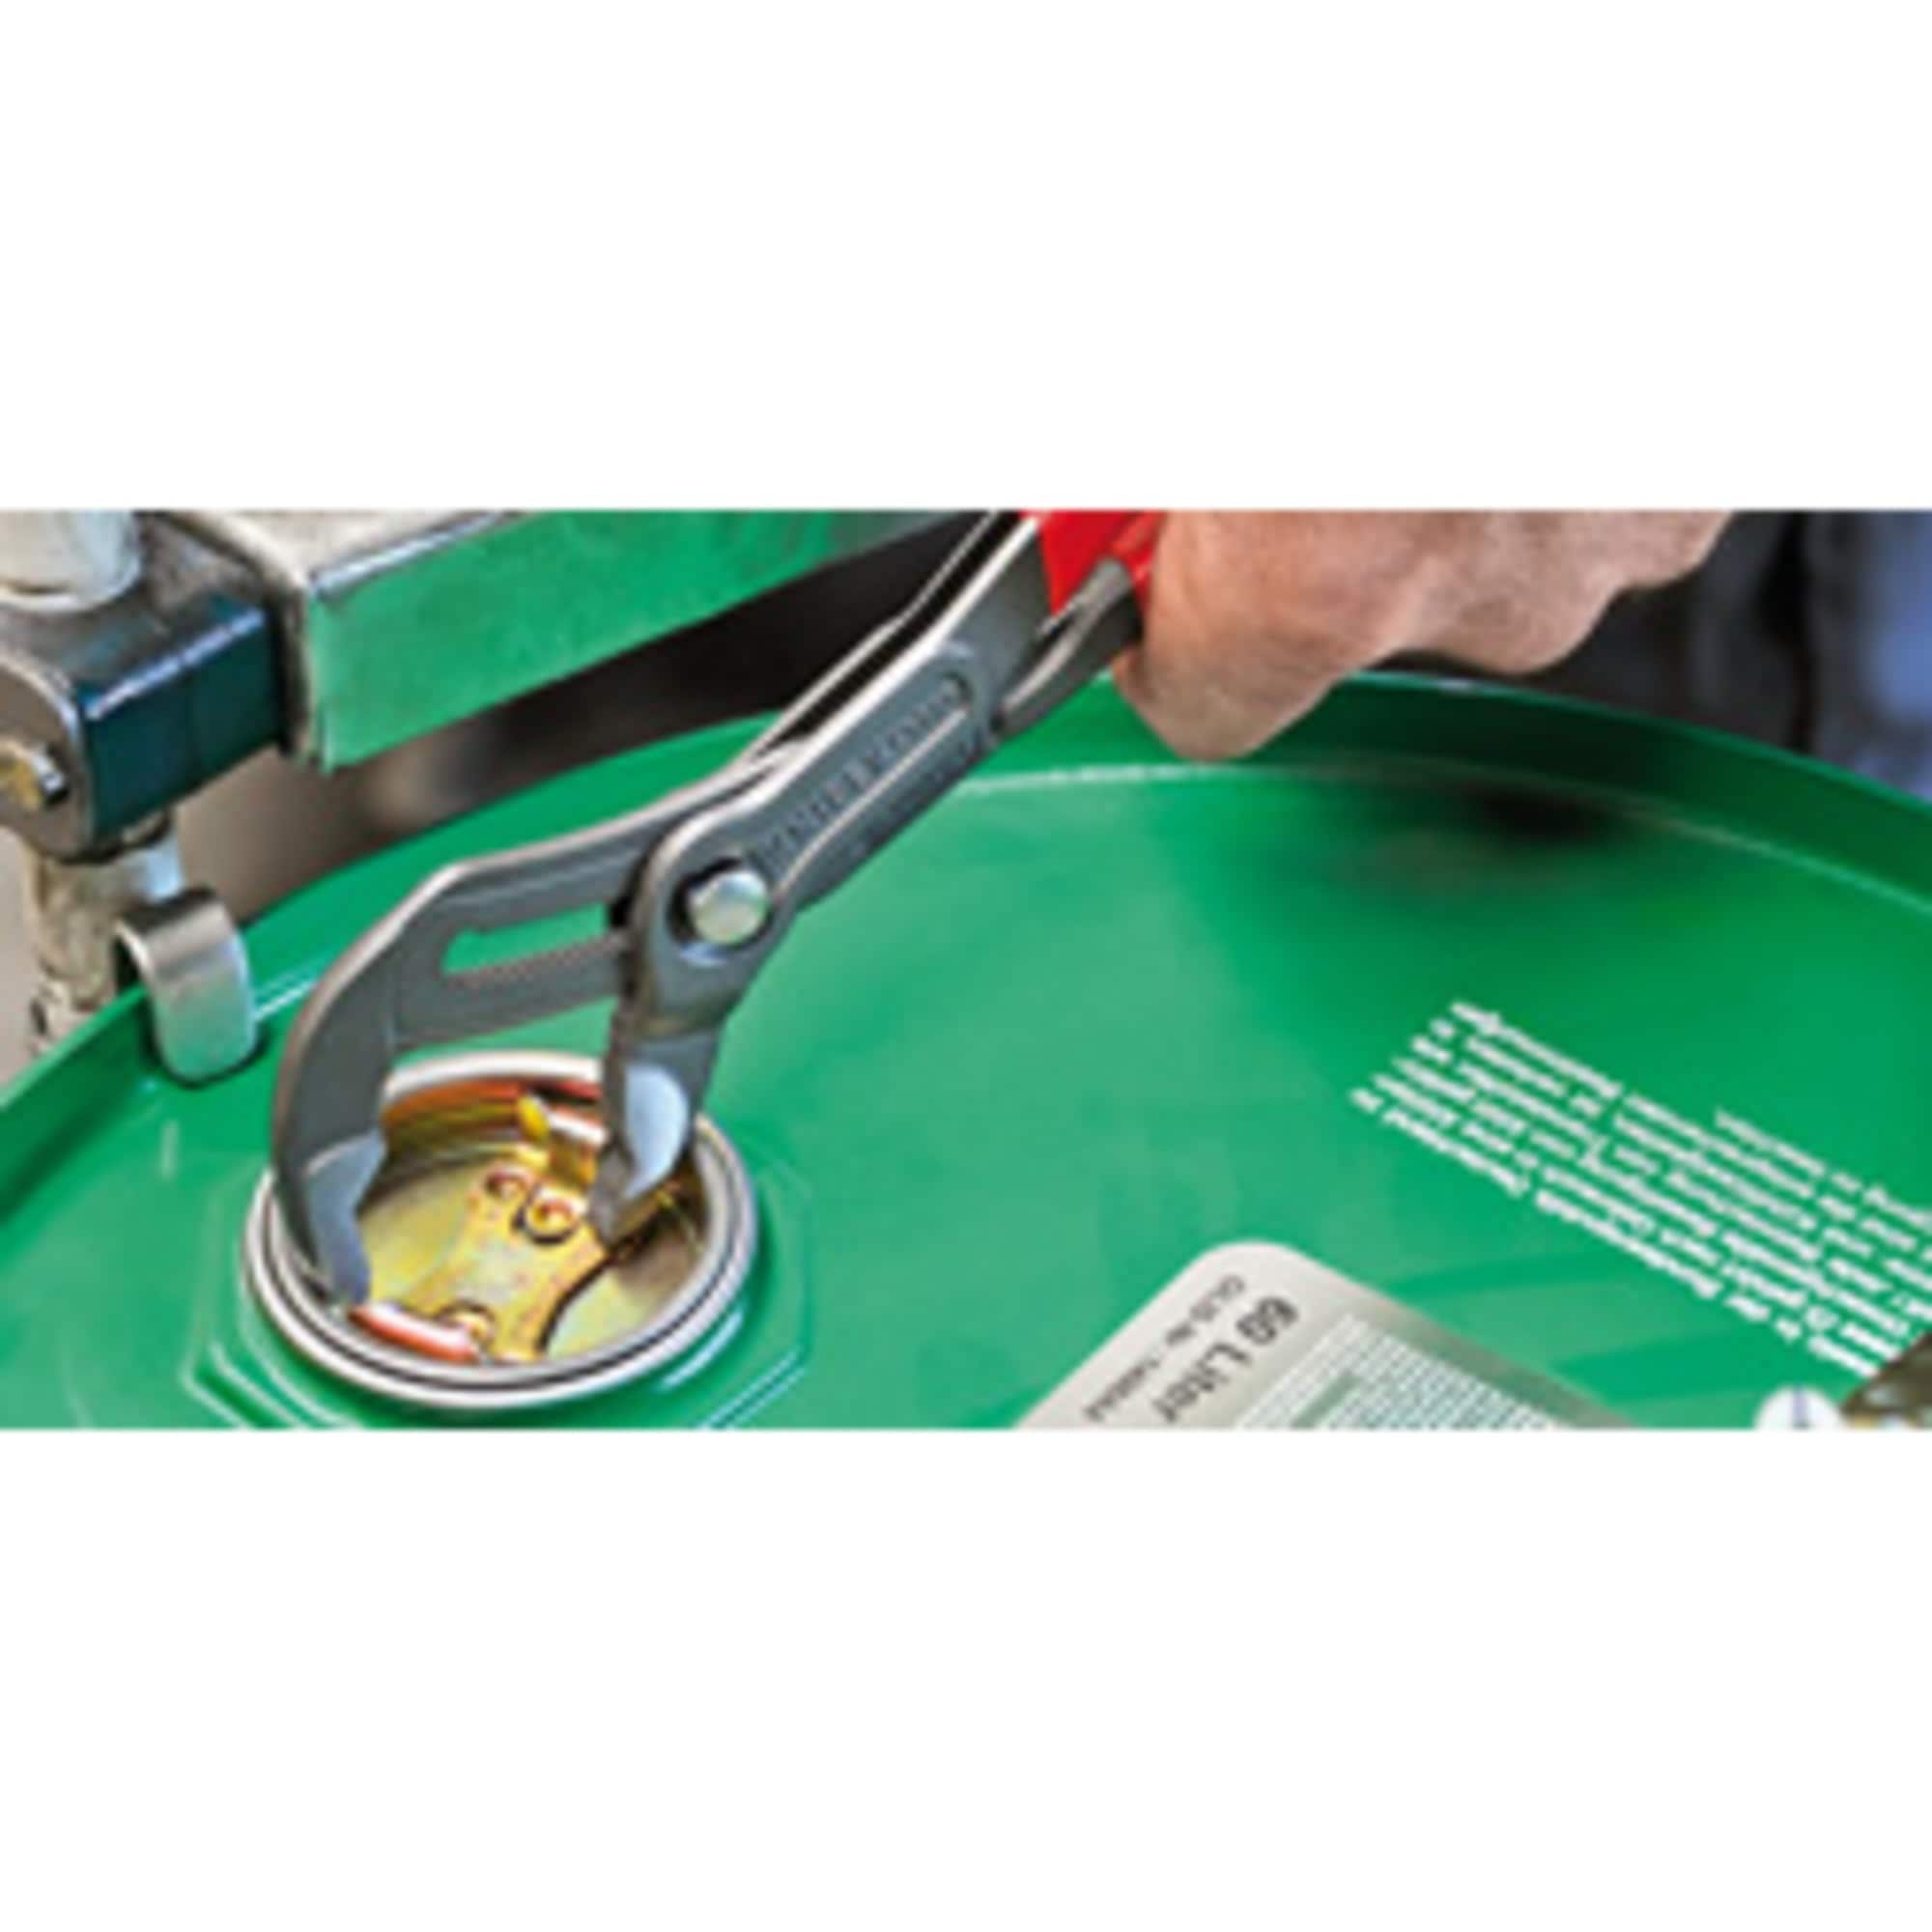 Knipex Rohr- / Wasserpumpen-Zange Cobra 87 01 150, 150mm